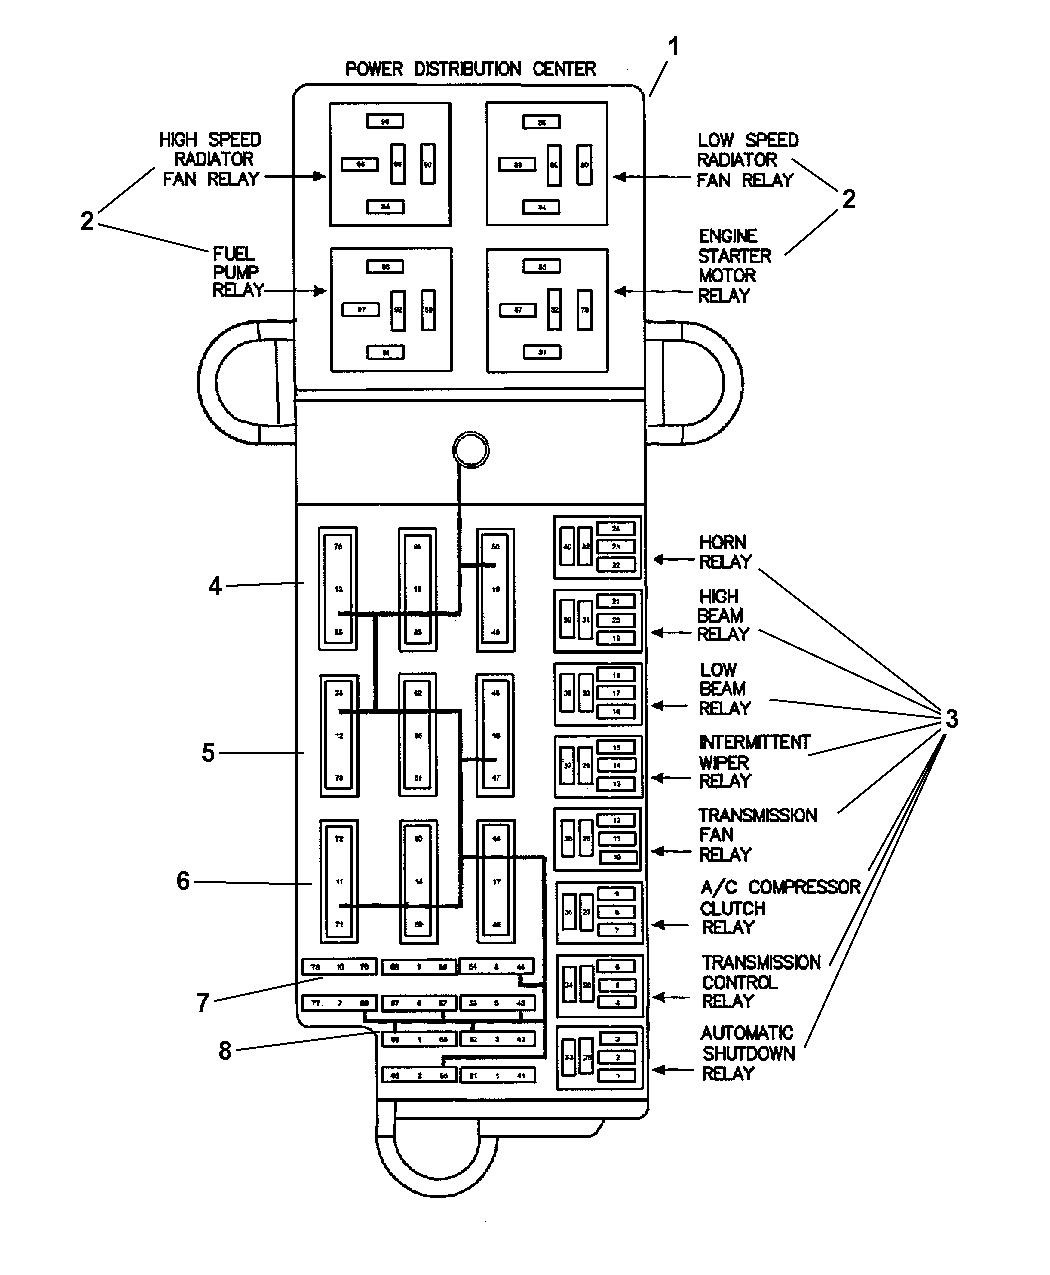 Plymouth Prowler Wiring Diagram - Wiring Diagram